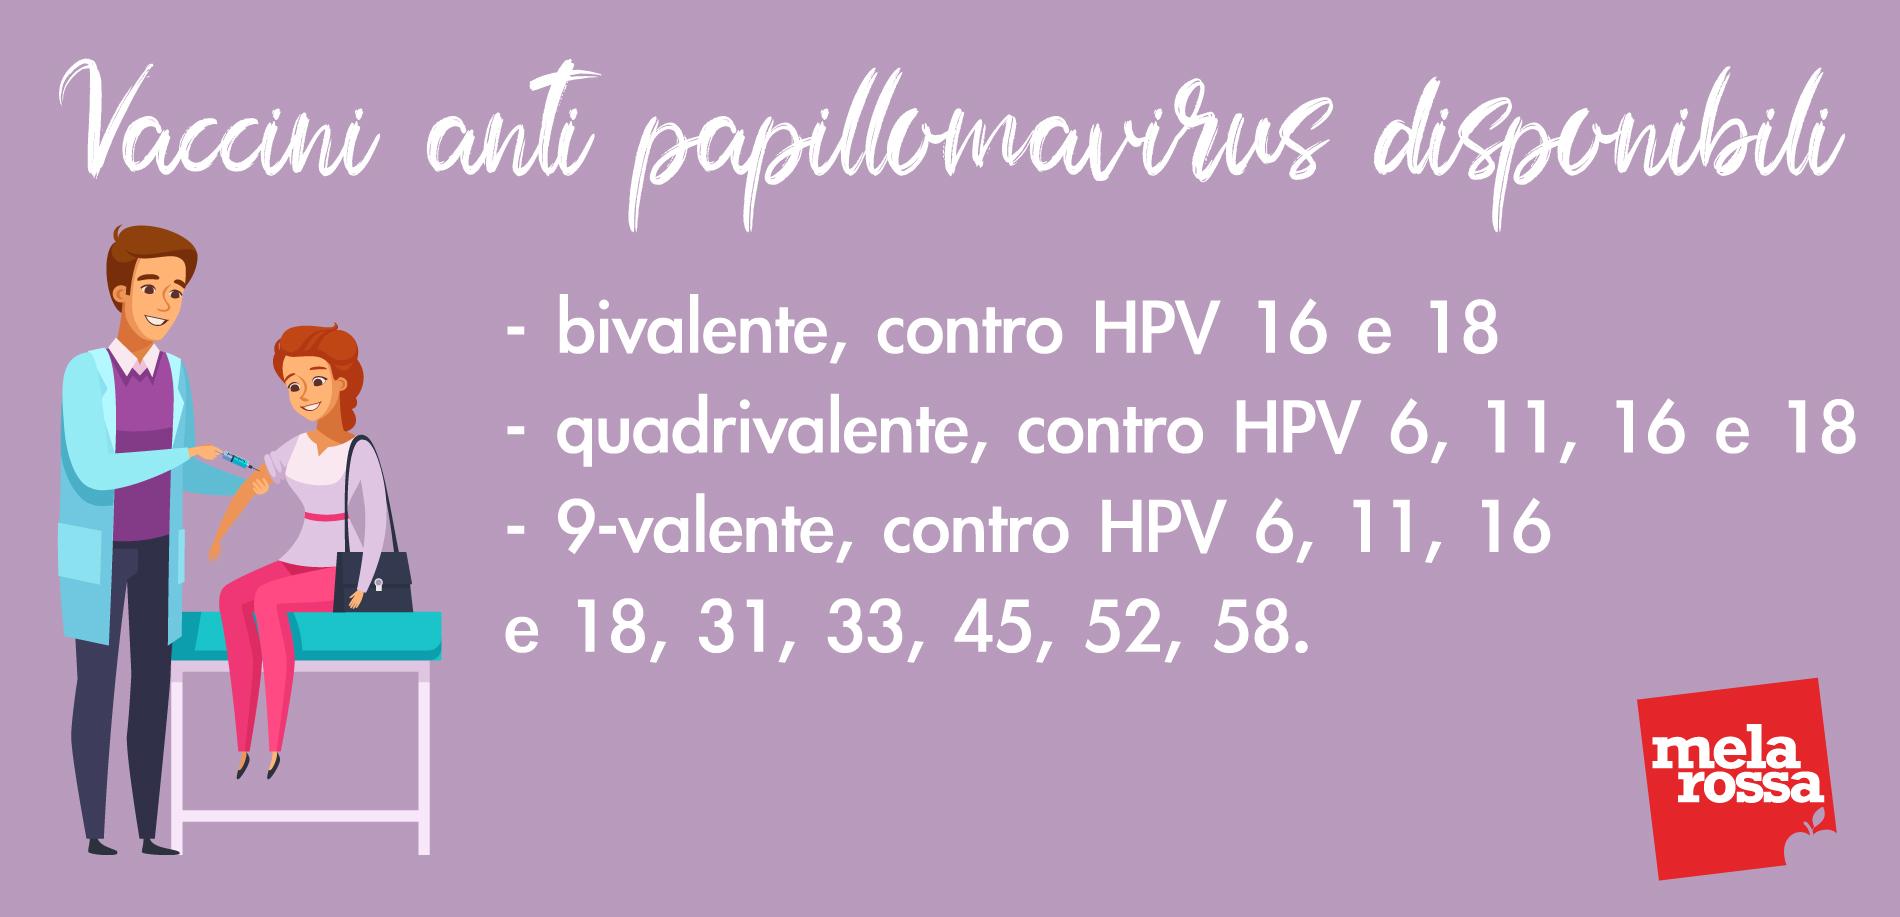 papilloma virus ceppi oncogeni